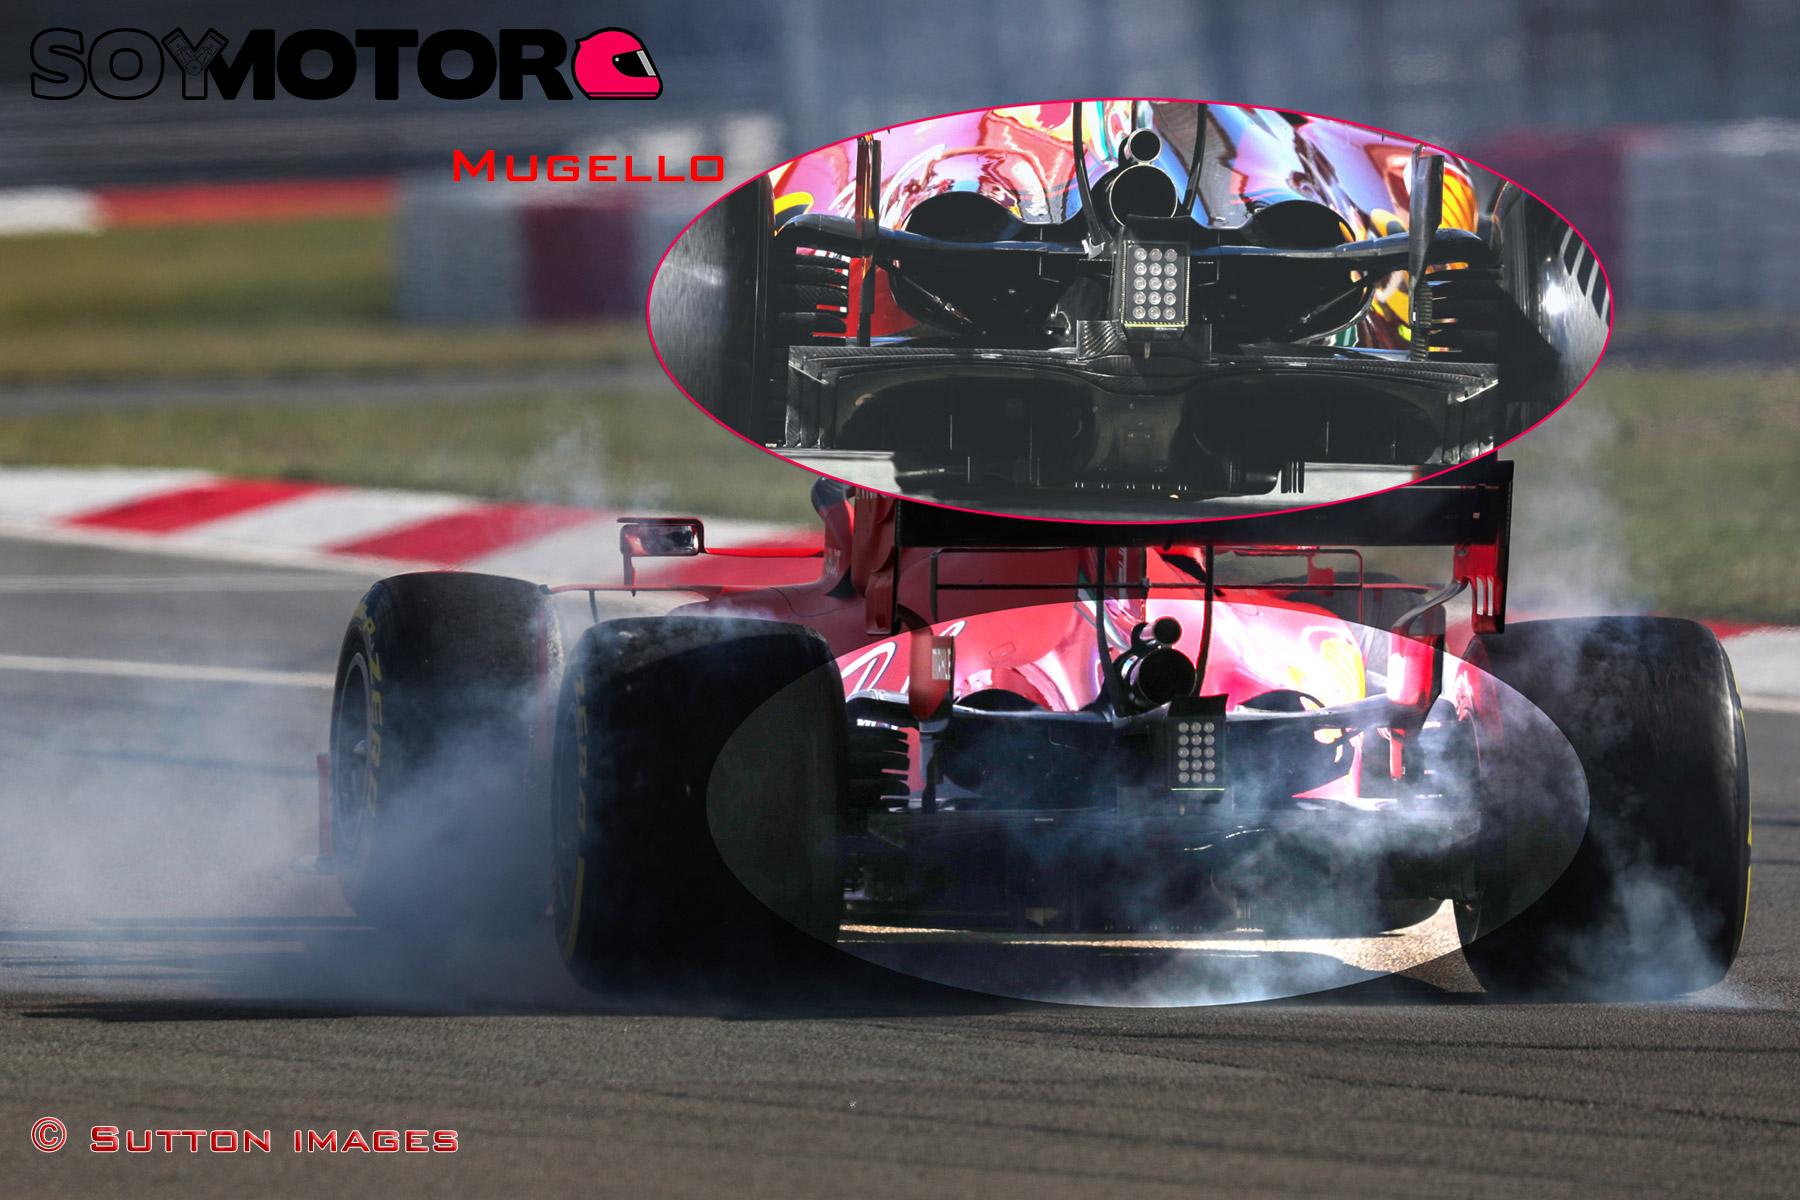 ferrari-suspension-trasera2-soymotor.jpg